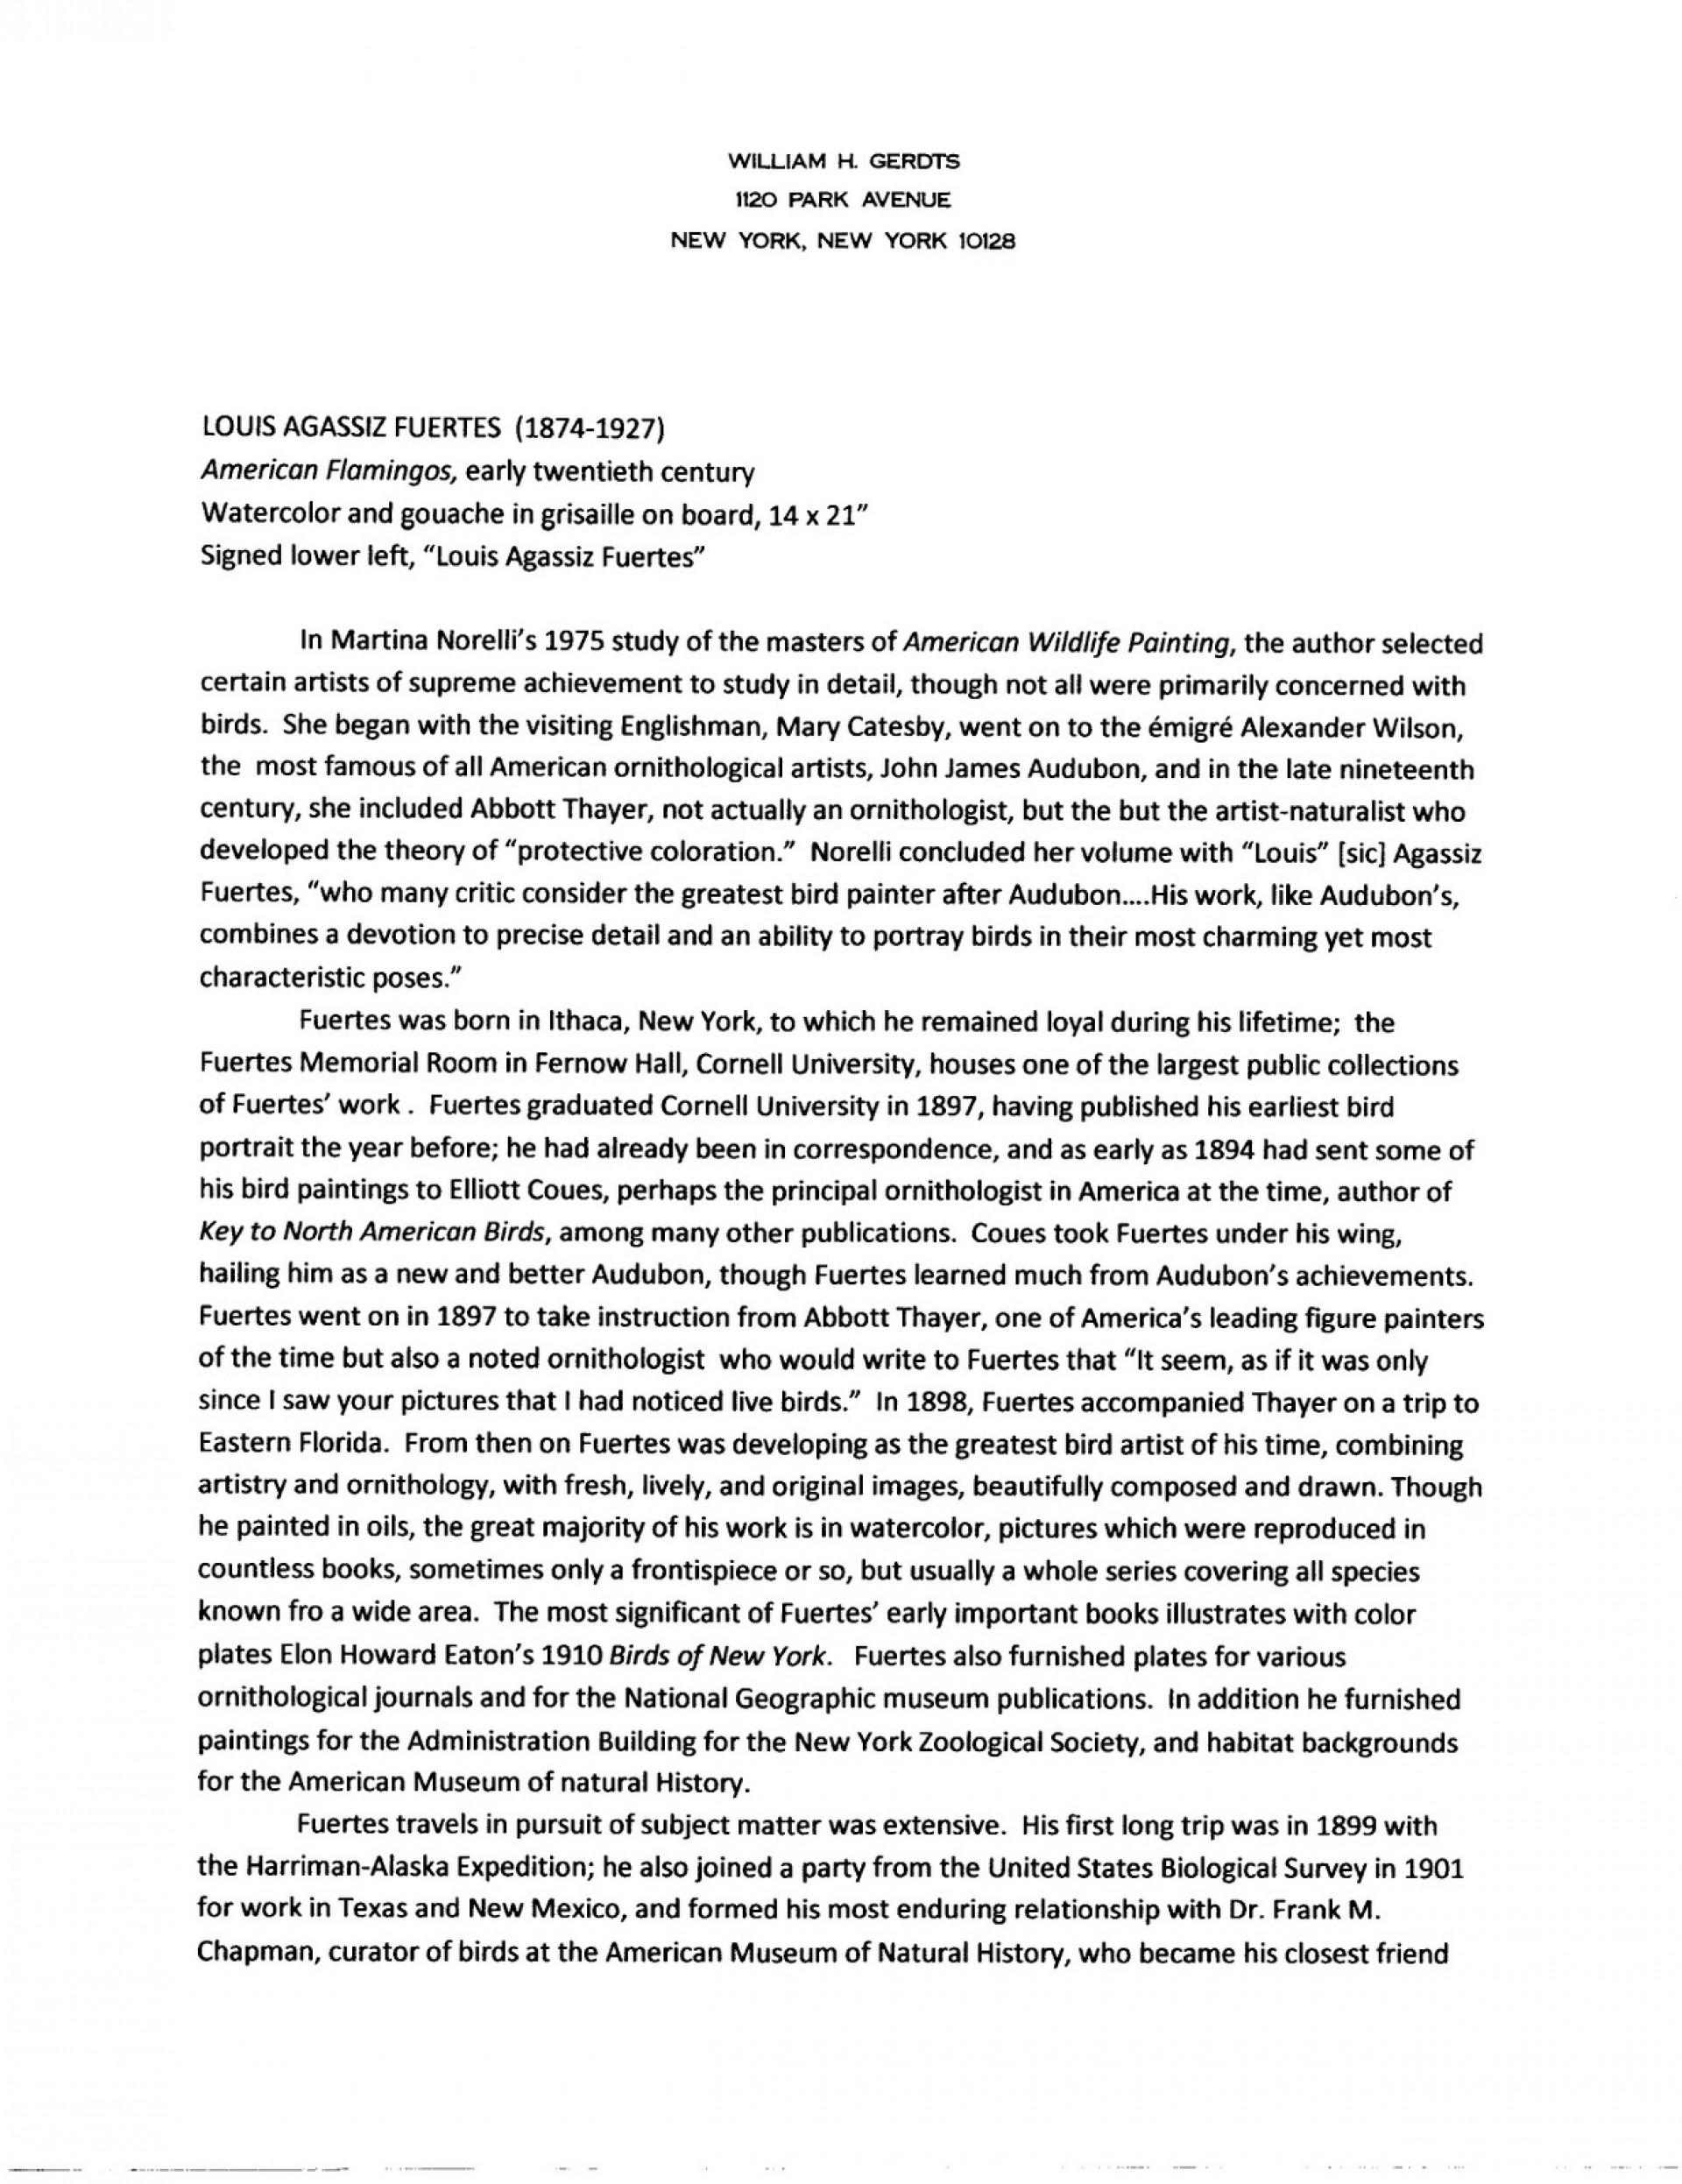 002 Graduate Admissions Essay Fuertes20american20flamingos20001 Wondrous Sample Education Examples Nursing Admission Samples 1920